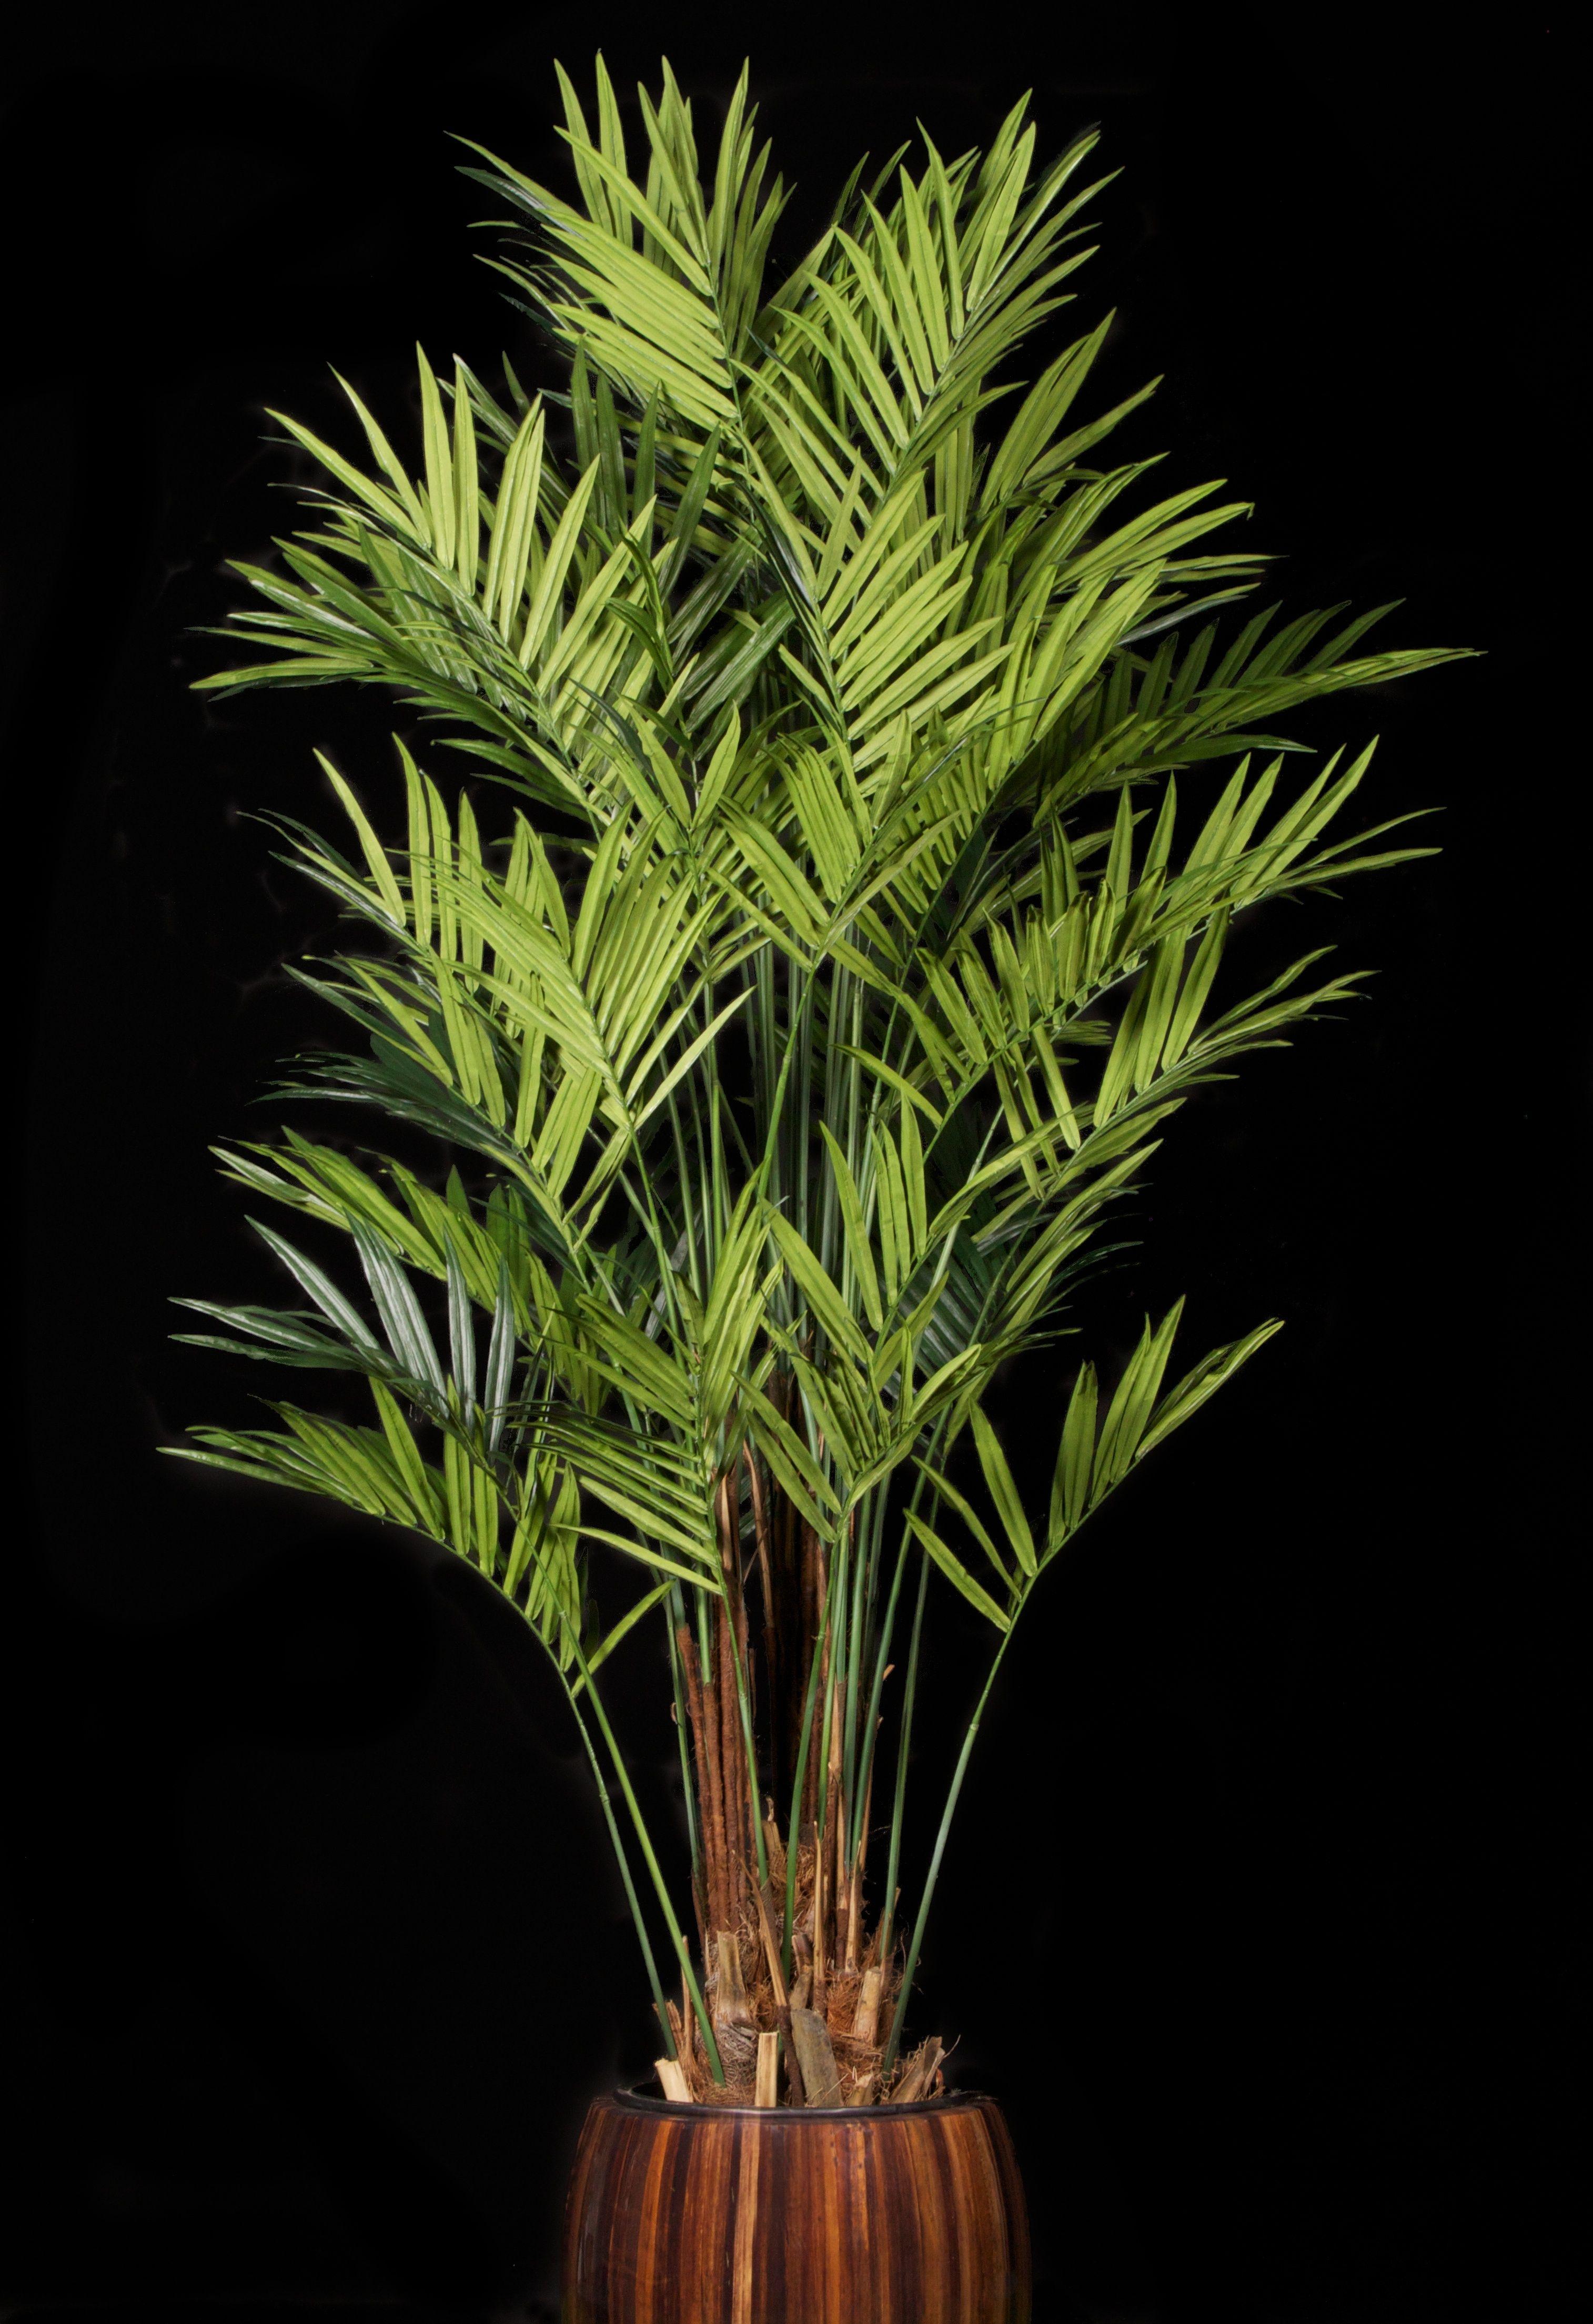 Replica Kentia Palm Kentia palm, Artificial trees, Wood tree